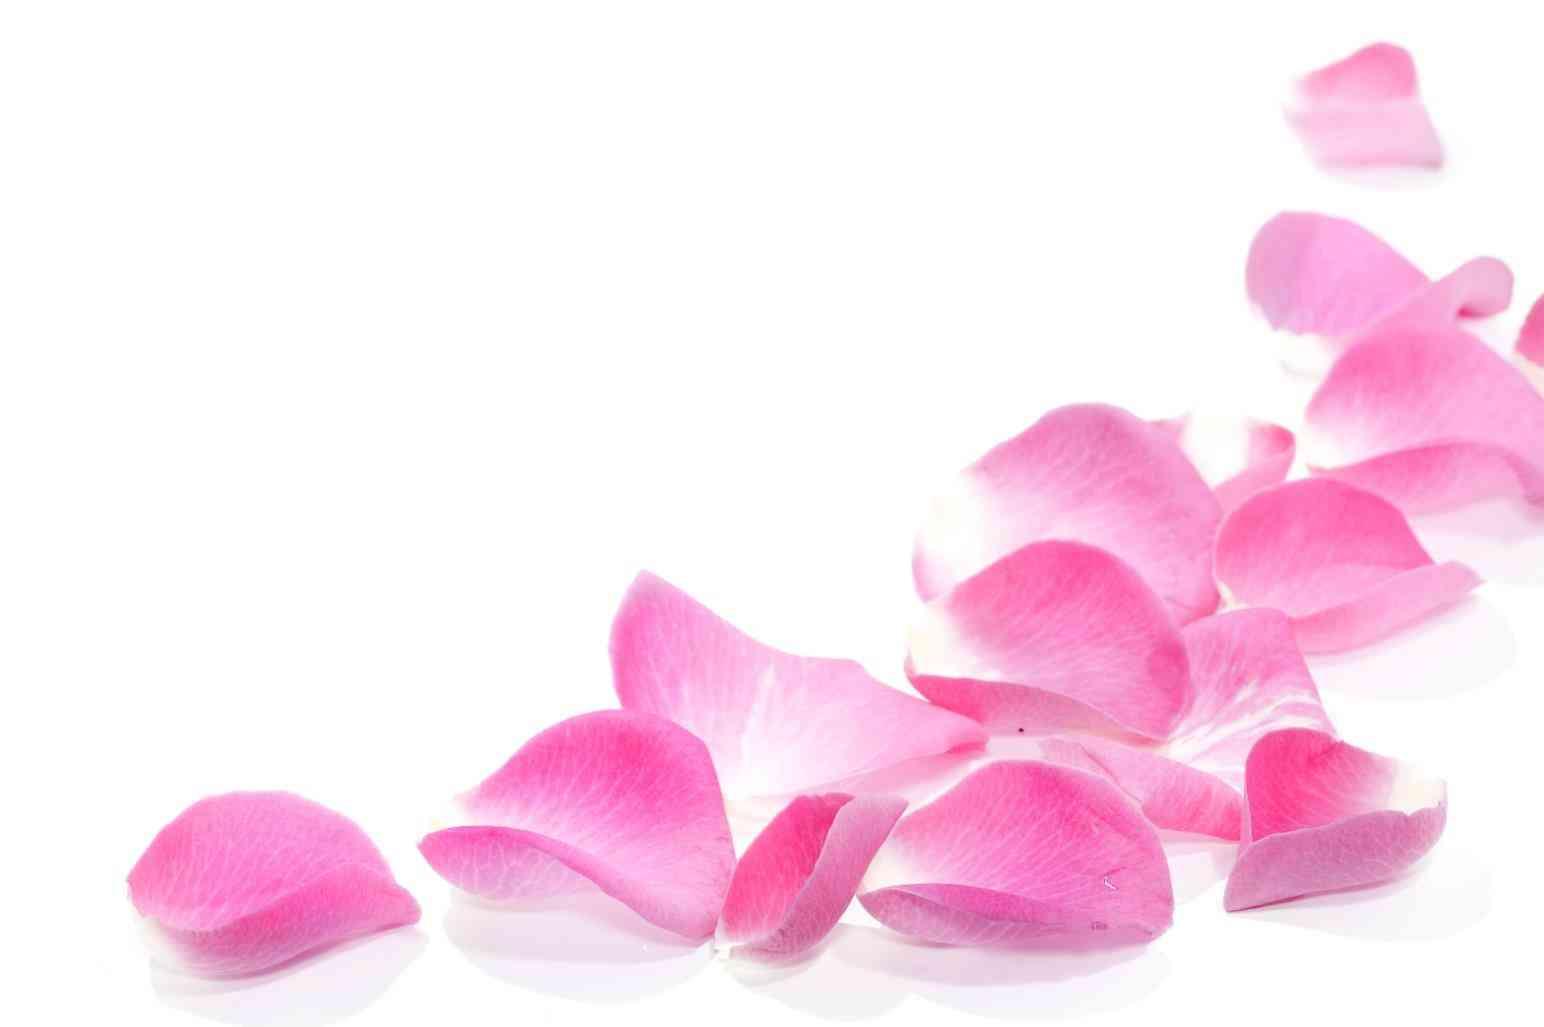 Pink rose petals clipart clip art free library Rose Petals Clipart   Free download best Rose Petals Clipart ... clip art free library